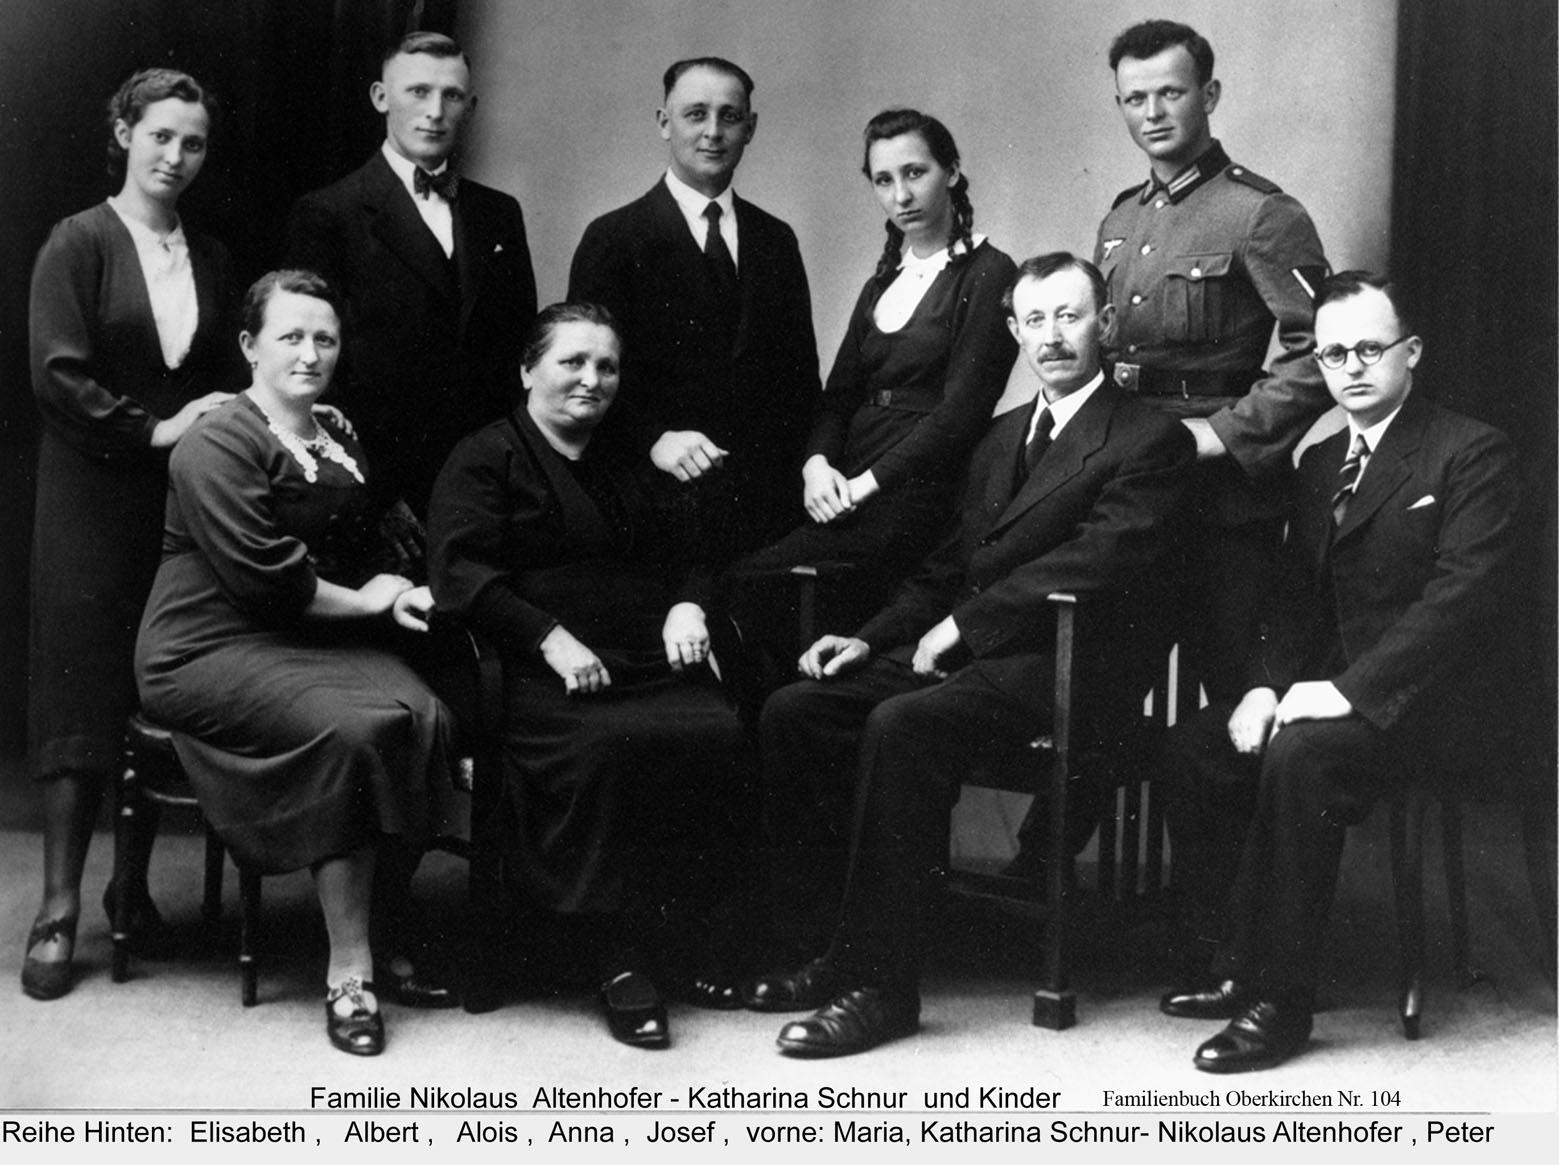 Familie Altenhofer